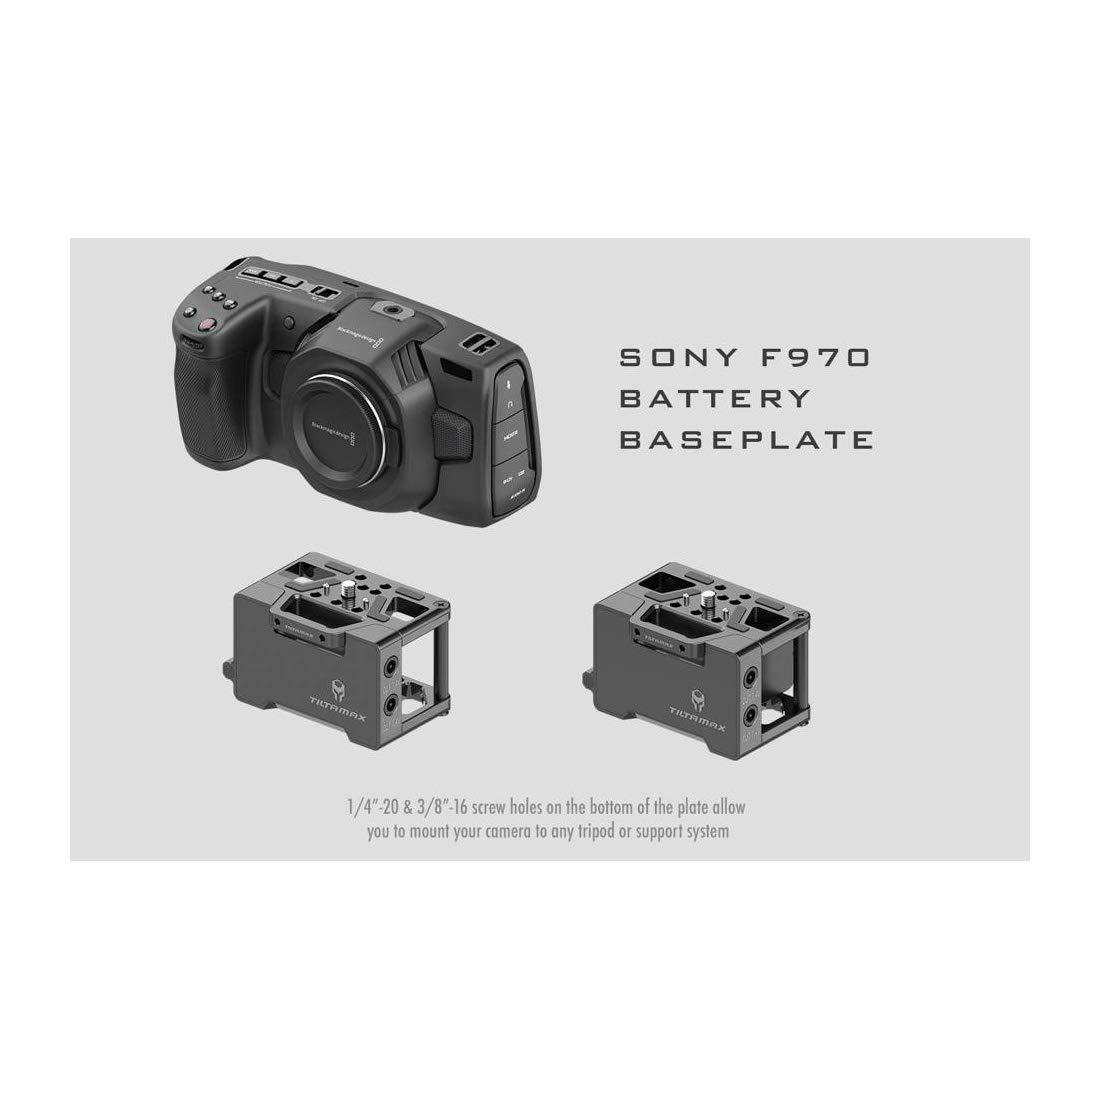 TILTA TA-BSP-F970 F970 Battery Baseplate For BMPCC 4K Cage Blackmagic Pocket Cinema Camera 4K Rig F970 Battery Baseplate